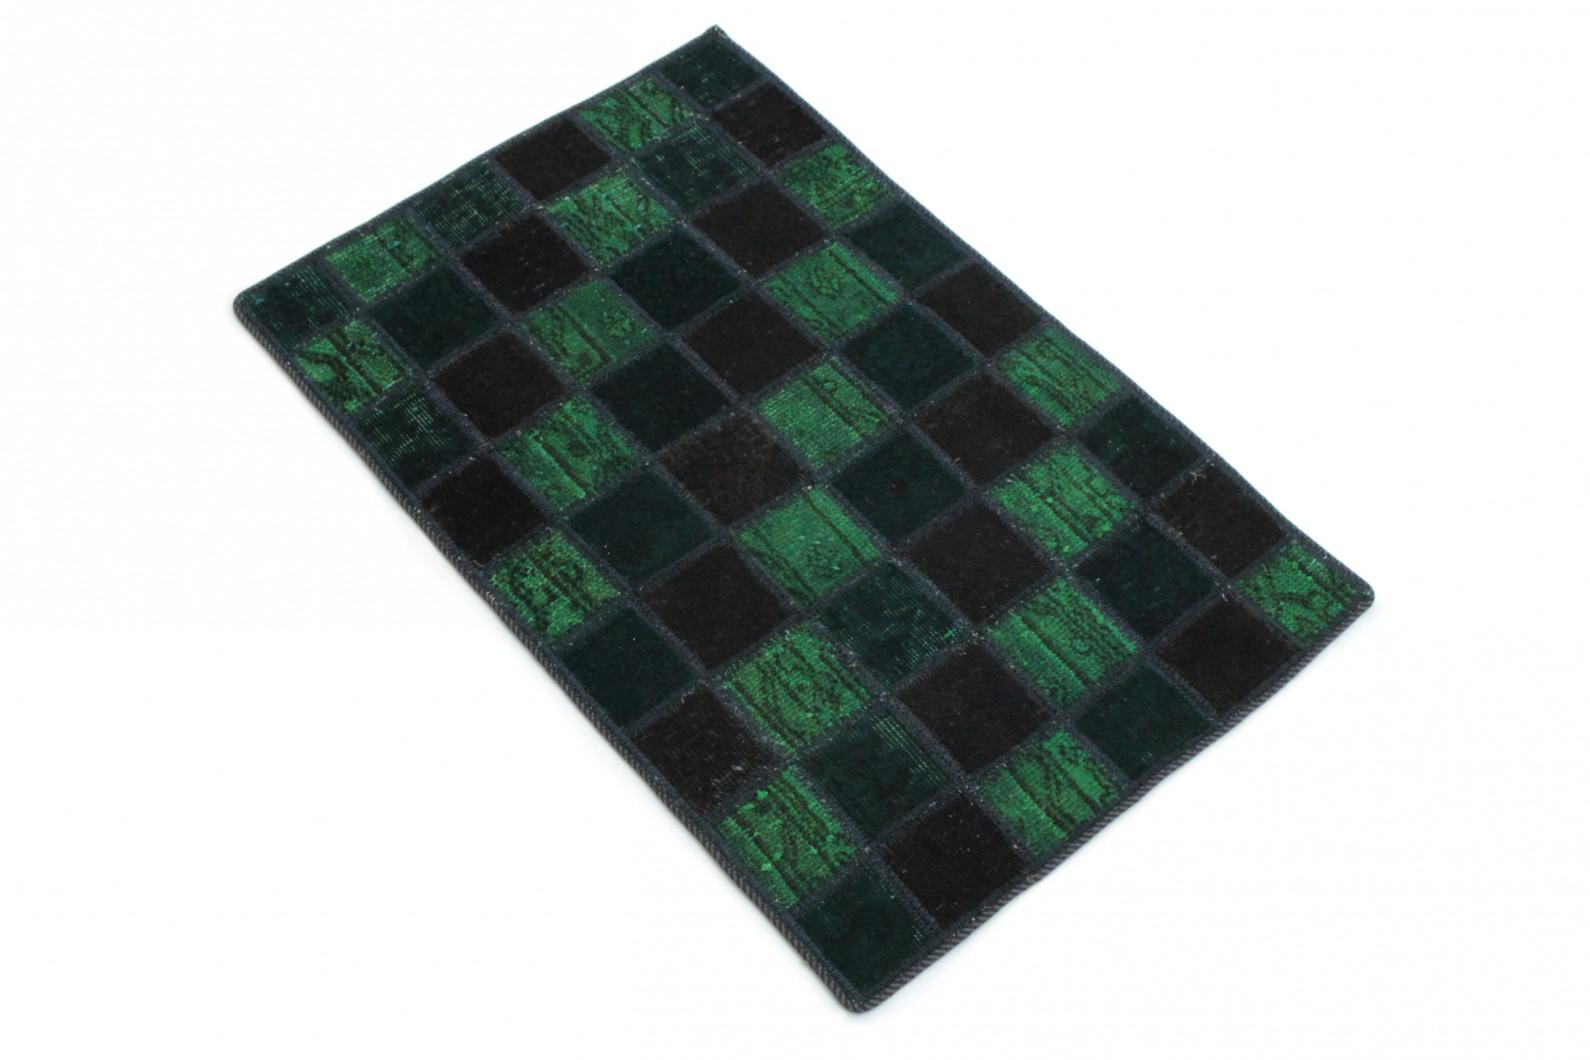 patchwork teppich gr n blau schwarz in 90x60 1001 167104. Black Bedroom Furniture Sets. Home Design Ideas